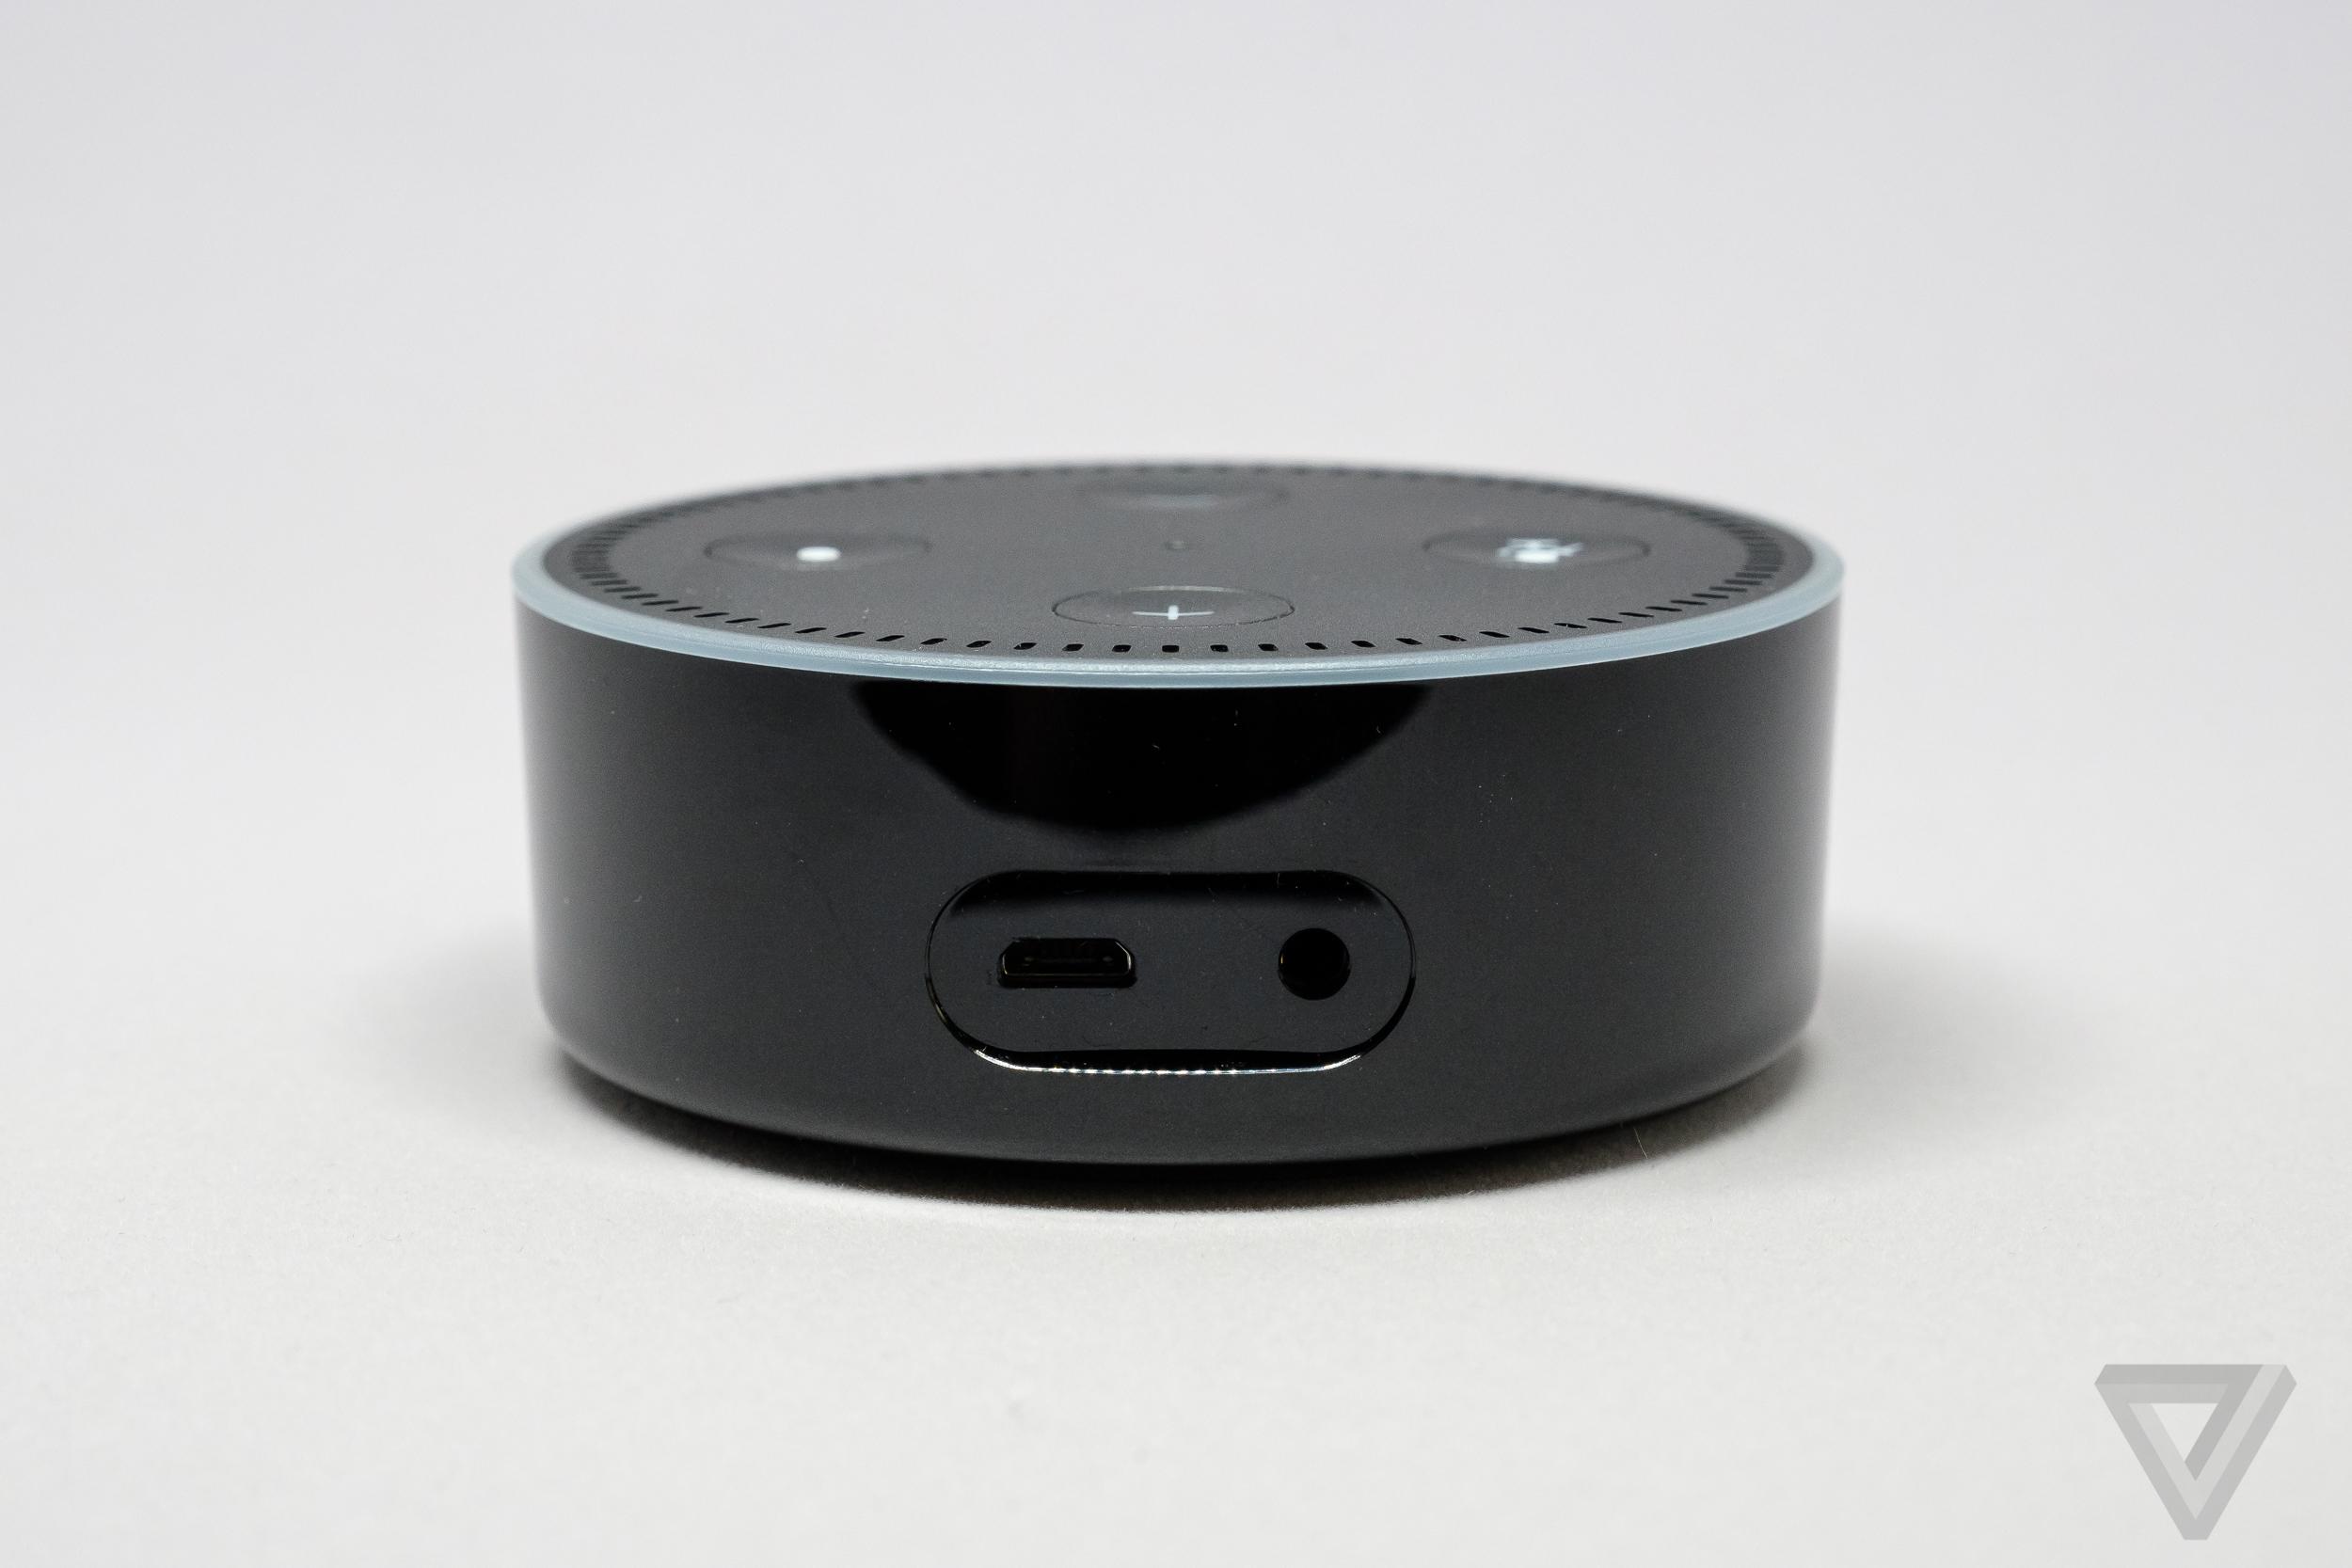 amazon u0027s simpler cheaper echo dot is still pretty great the verge